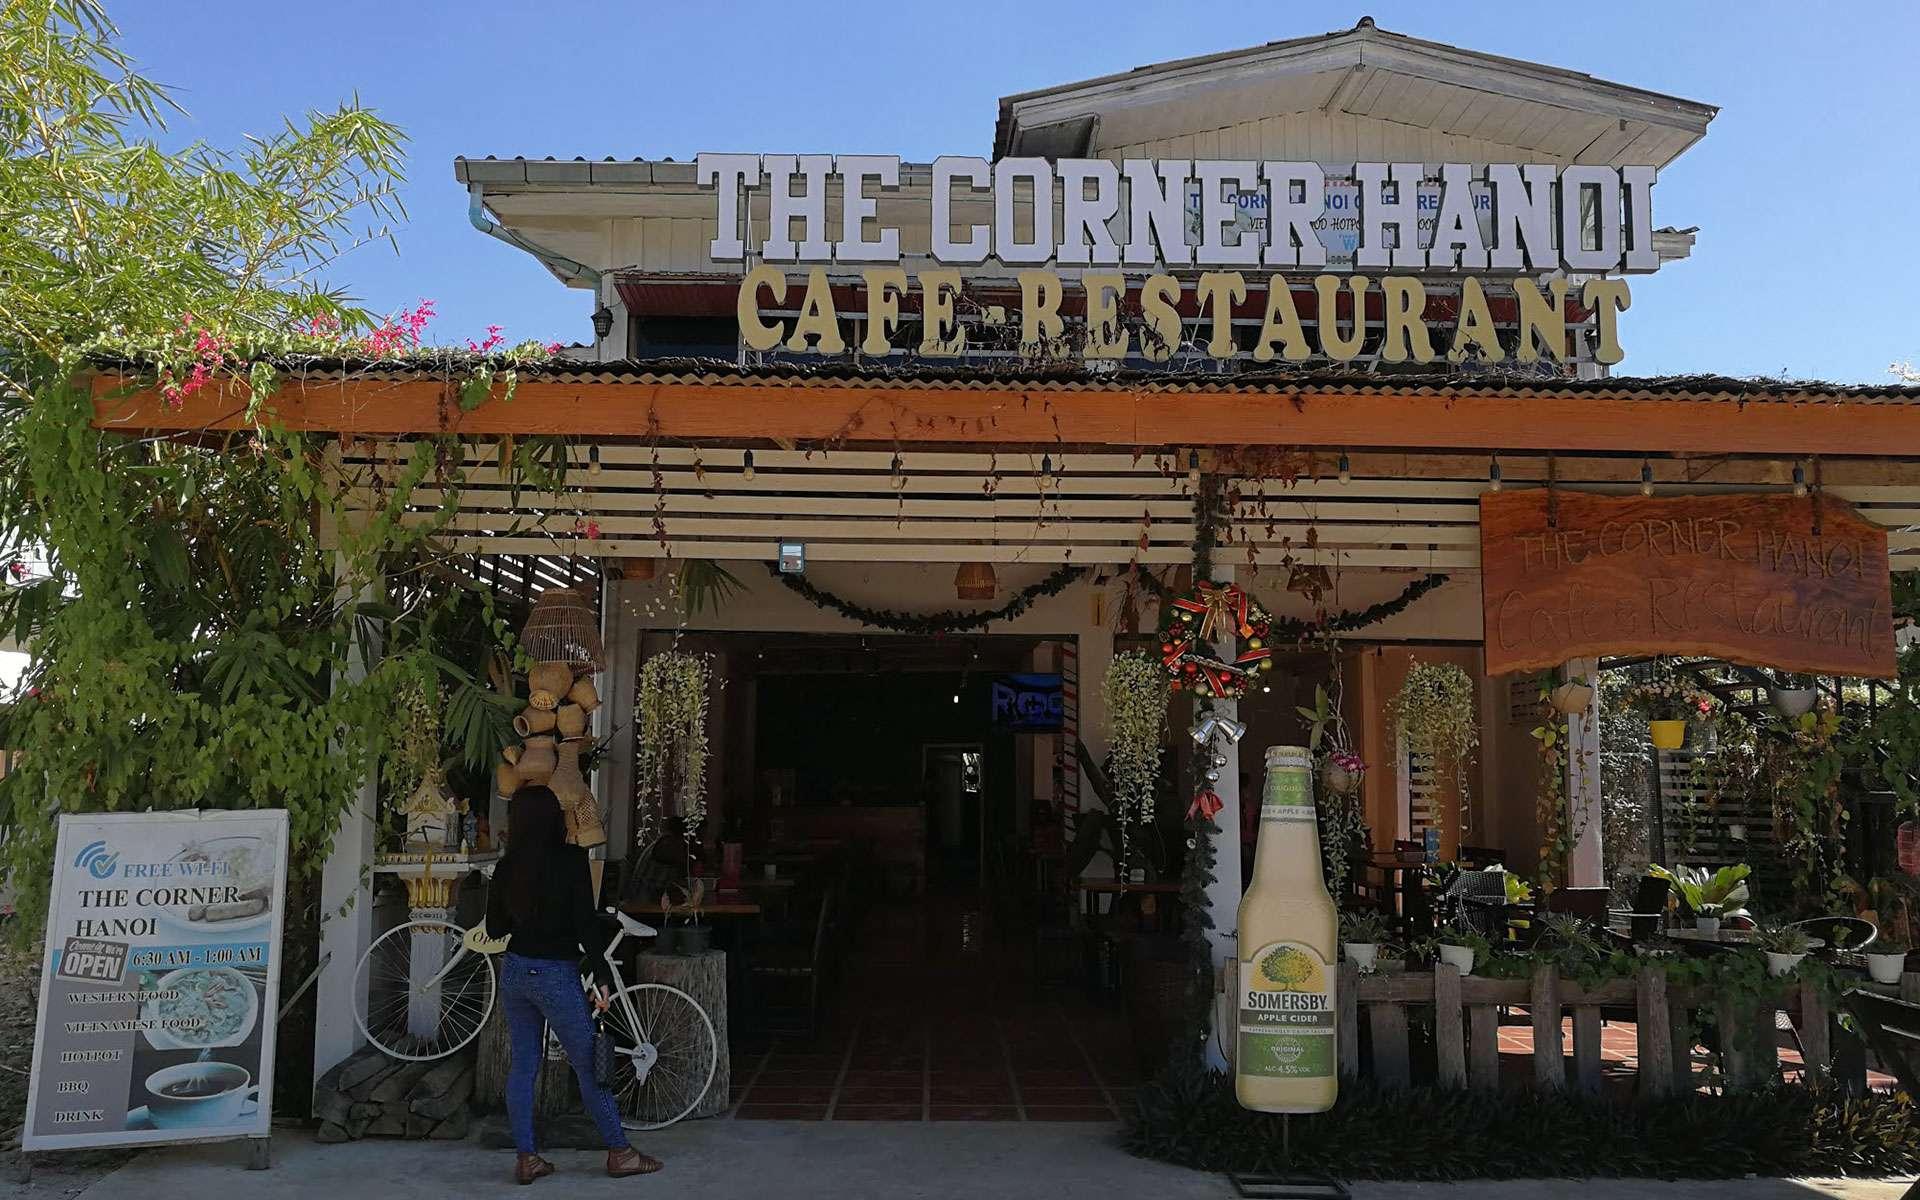 The Corner Hanoi Cafe in Vang Vieng